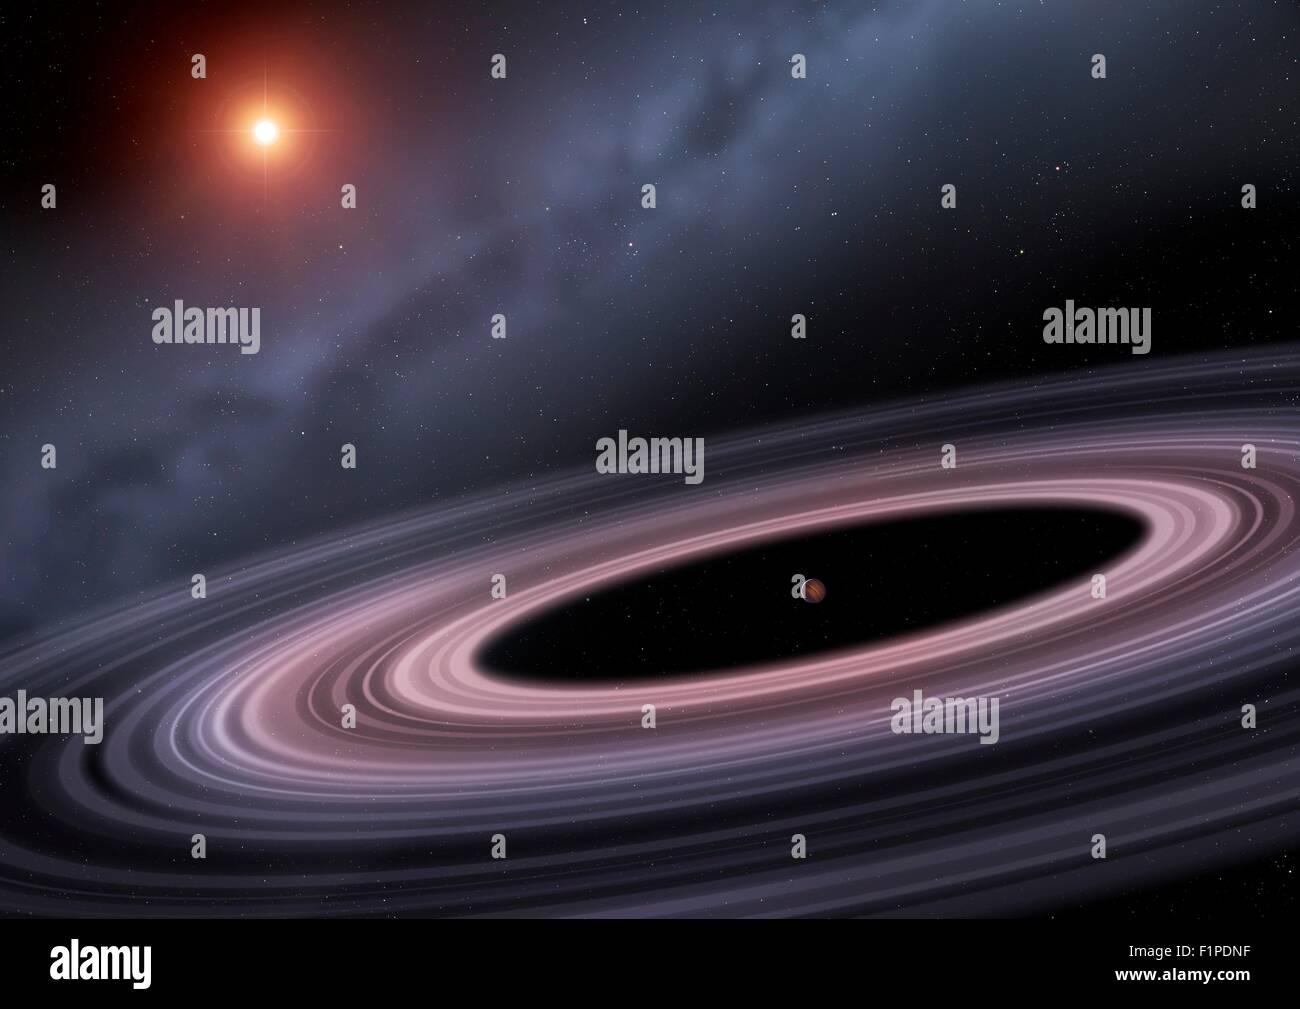 7 earthsized planets found orbiting star 39 lightyears - HD1300×1008